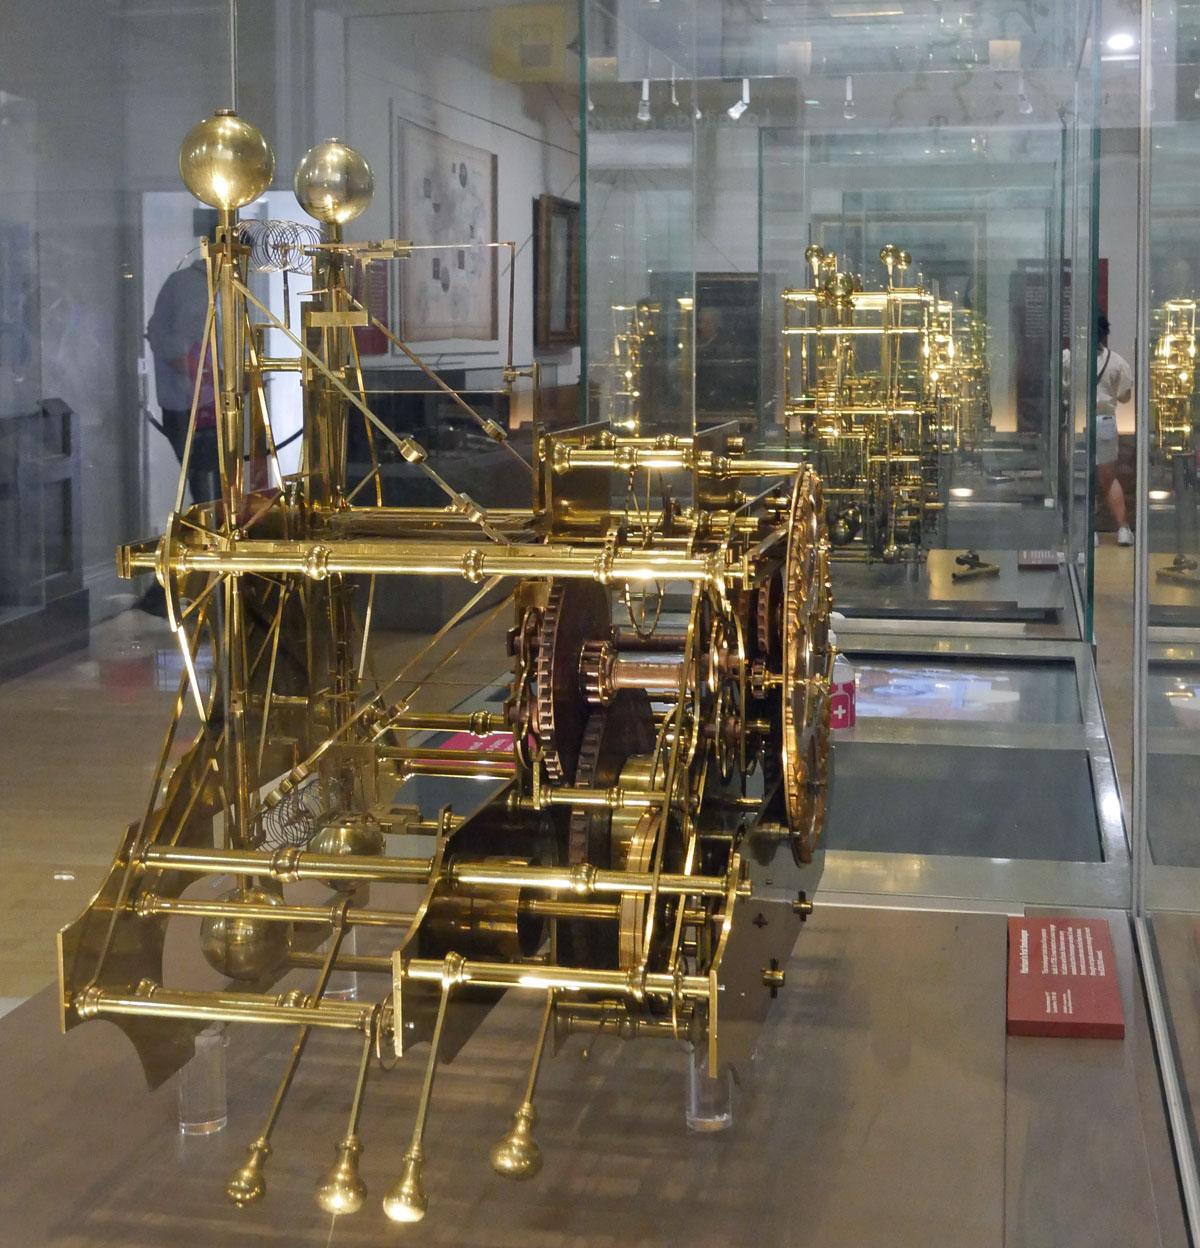 Harrison series of clocks - Royal Observatory Greenwich